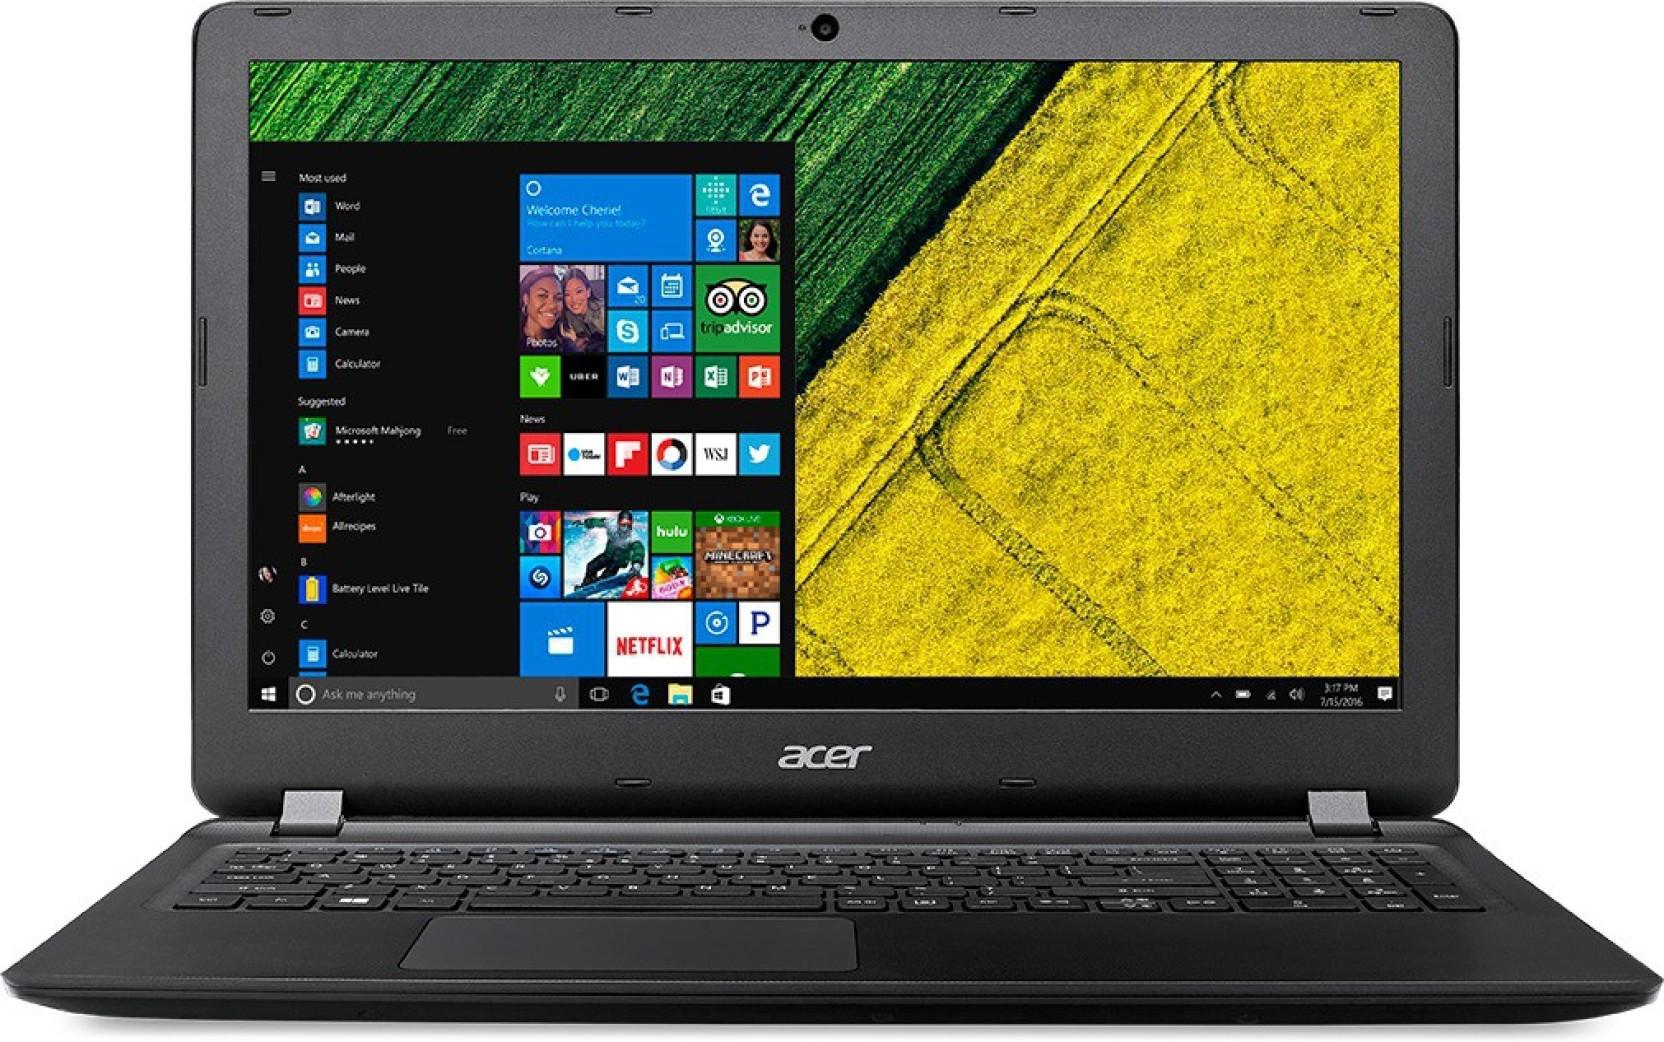 Acer ES 15 Core i3 6th Gen (4 GB/500 GB HDD/Linux)